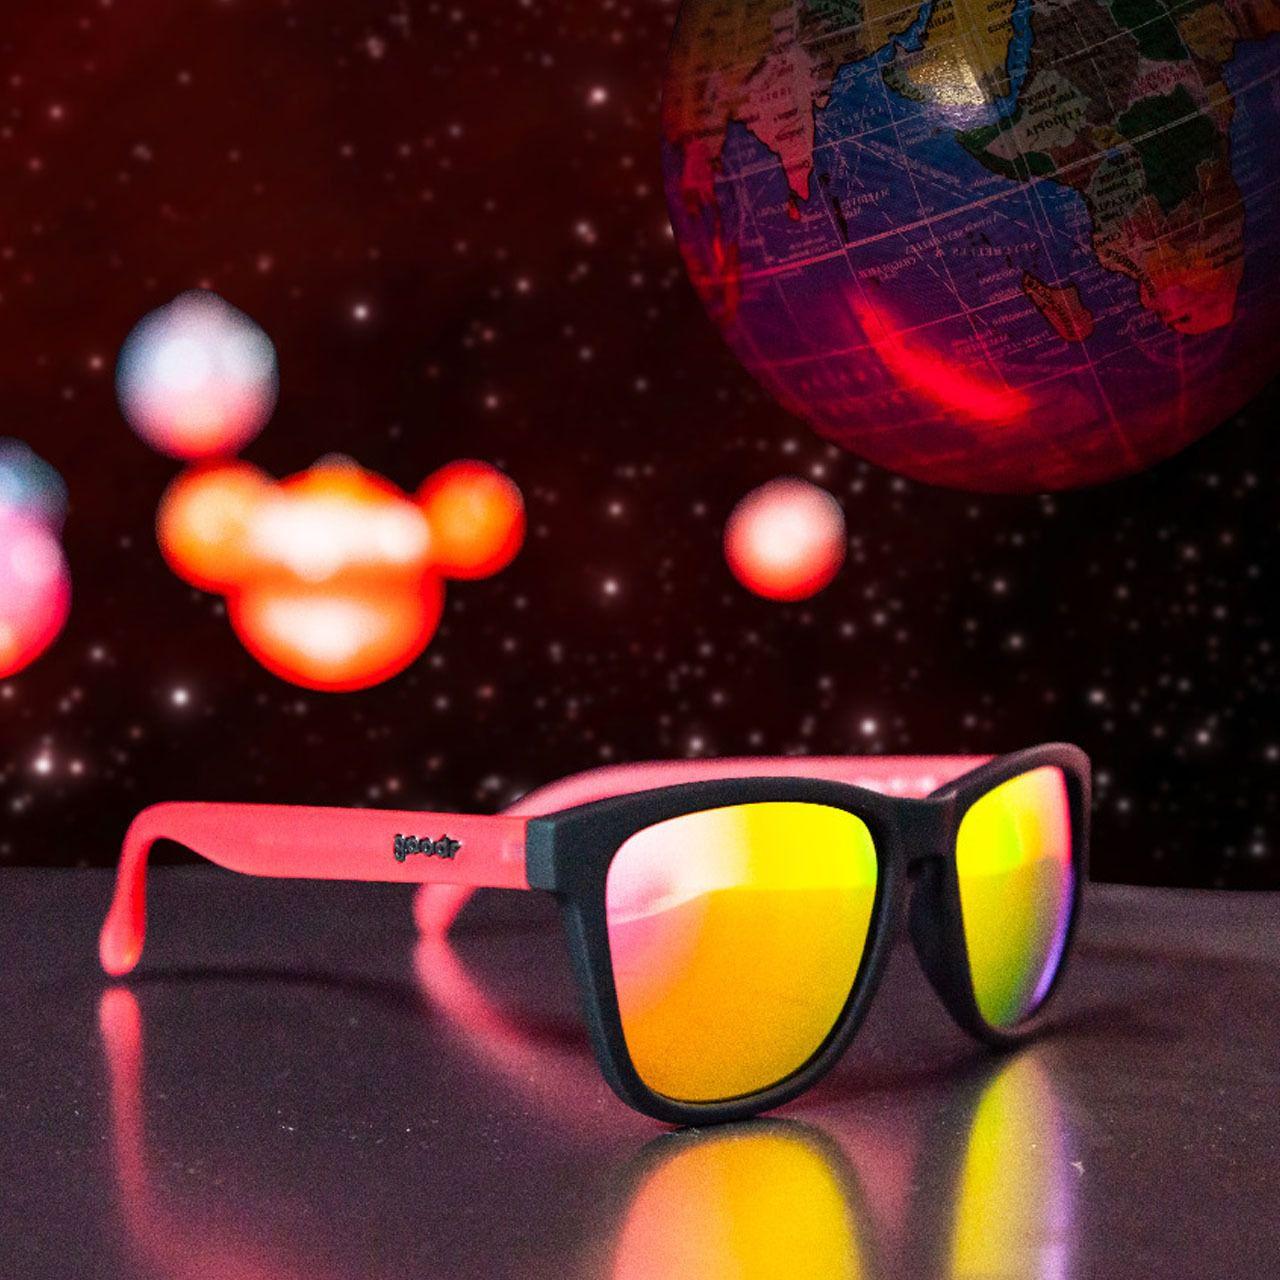 Óculos de Sol Goodr - Miss the Earth, Miss my Wine